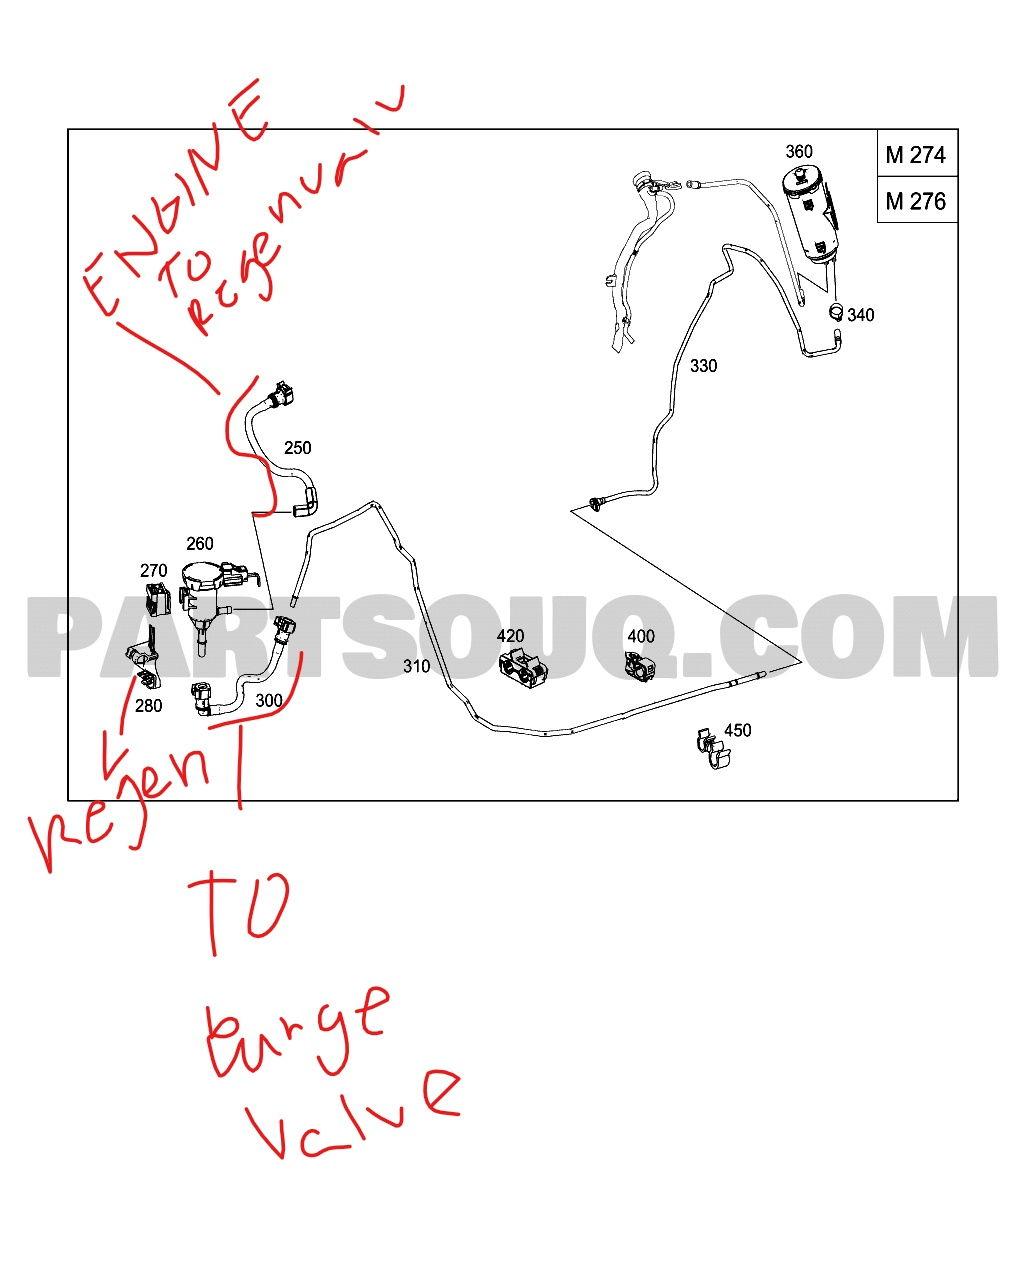 hight resolution of dragon gauge wiring diagram 2012 infiniti g37 fog light amp gauge wiring diagram dragon gauge tachometer